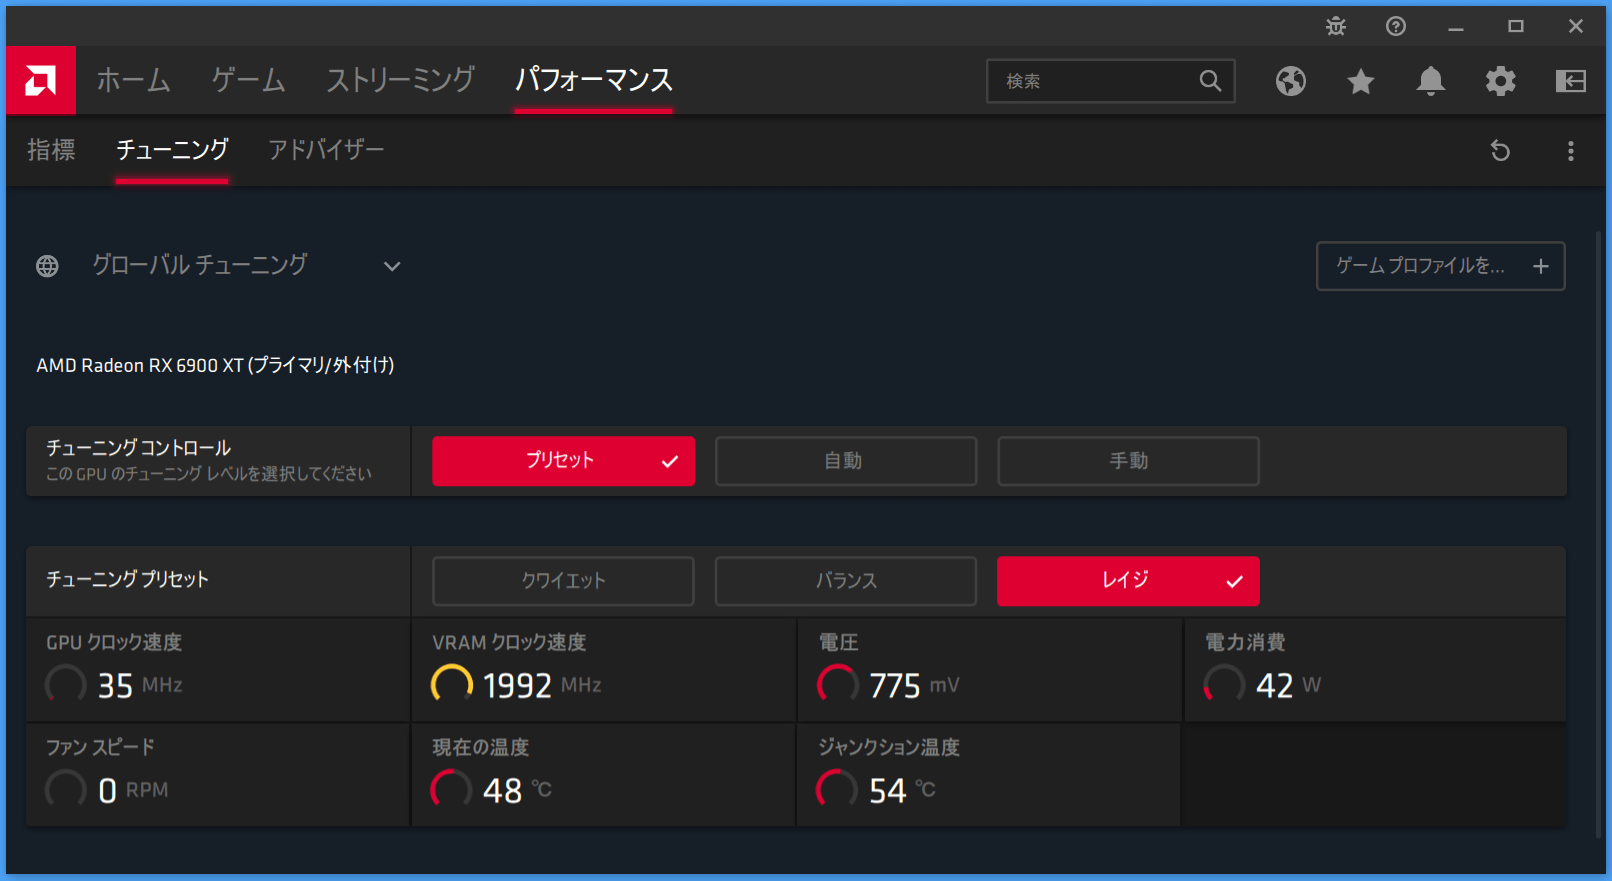 Radeon RX 6900 XT_Radeon-Setting_2